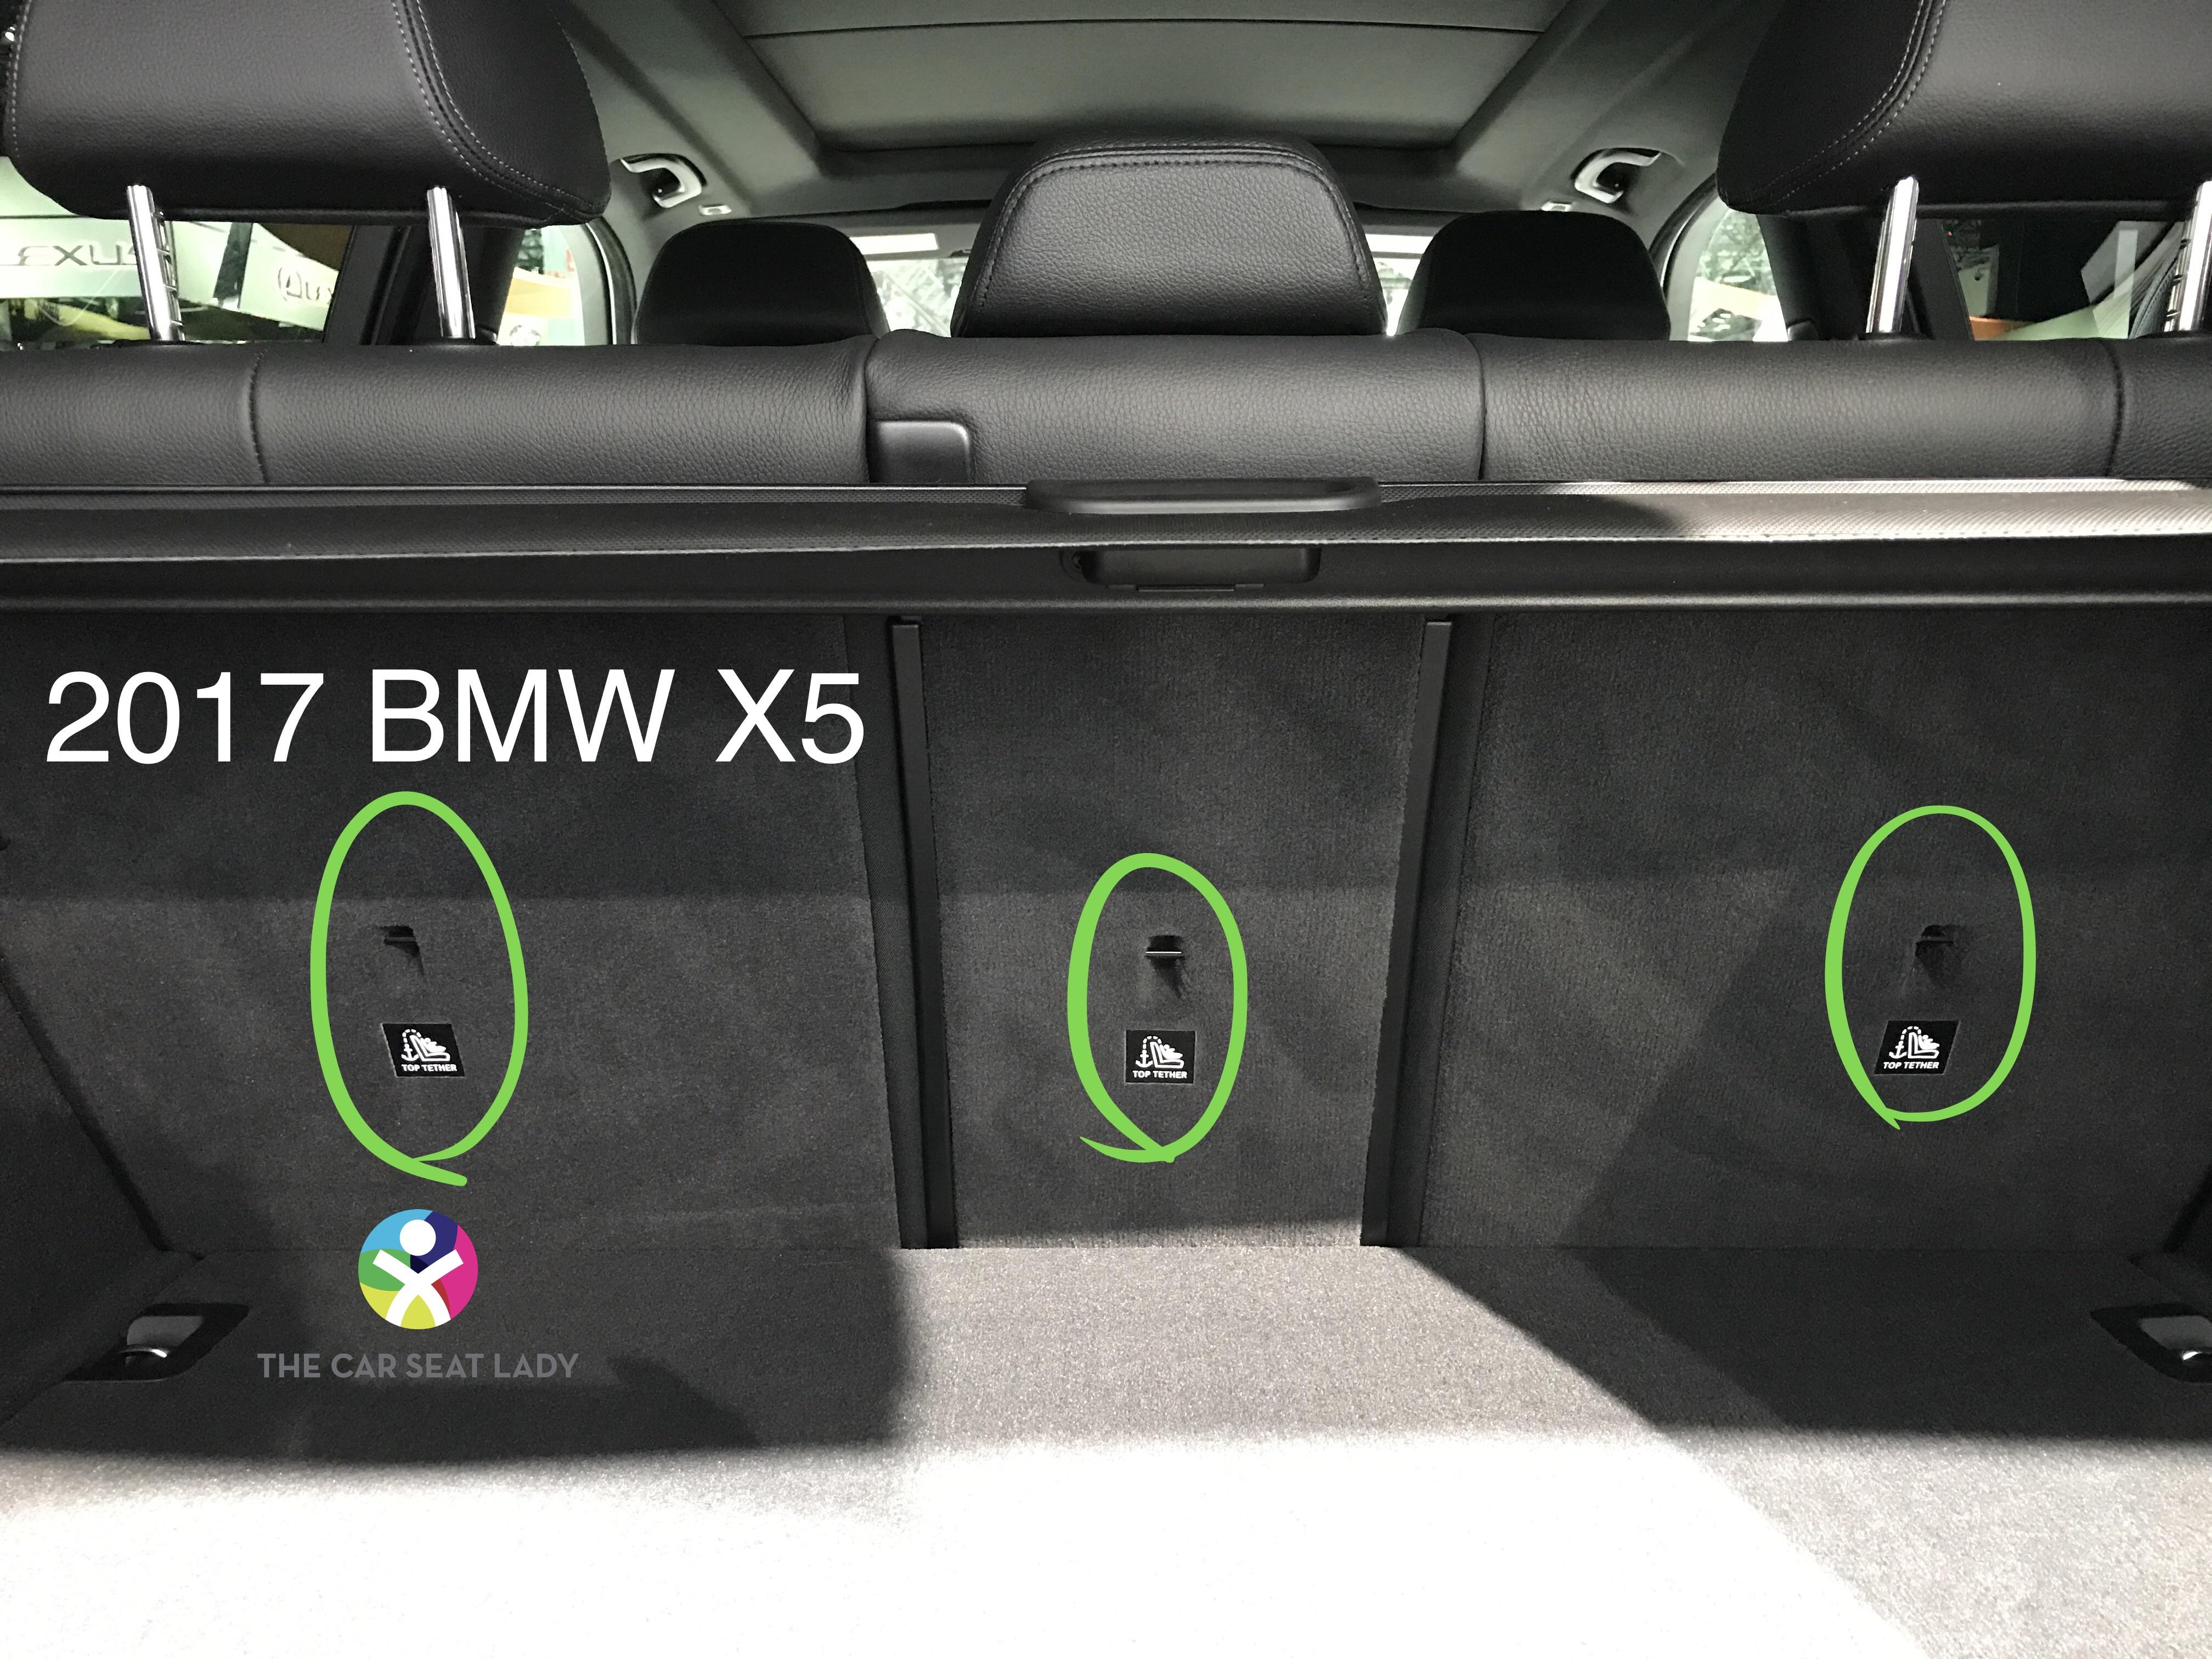 Etonnant U201cComfortu201d Rear Seats